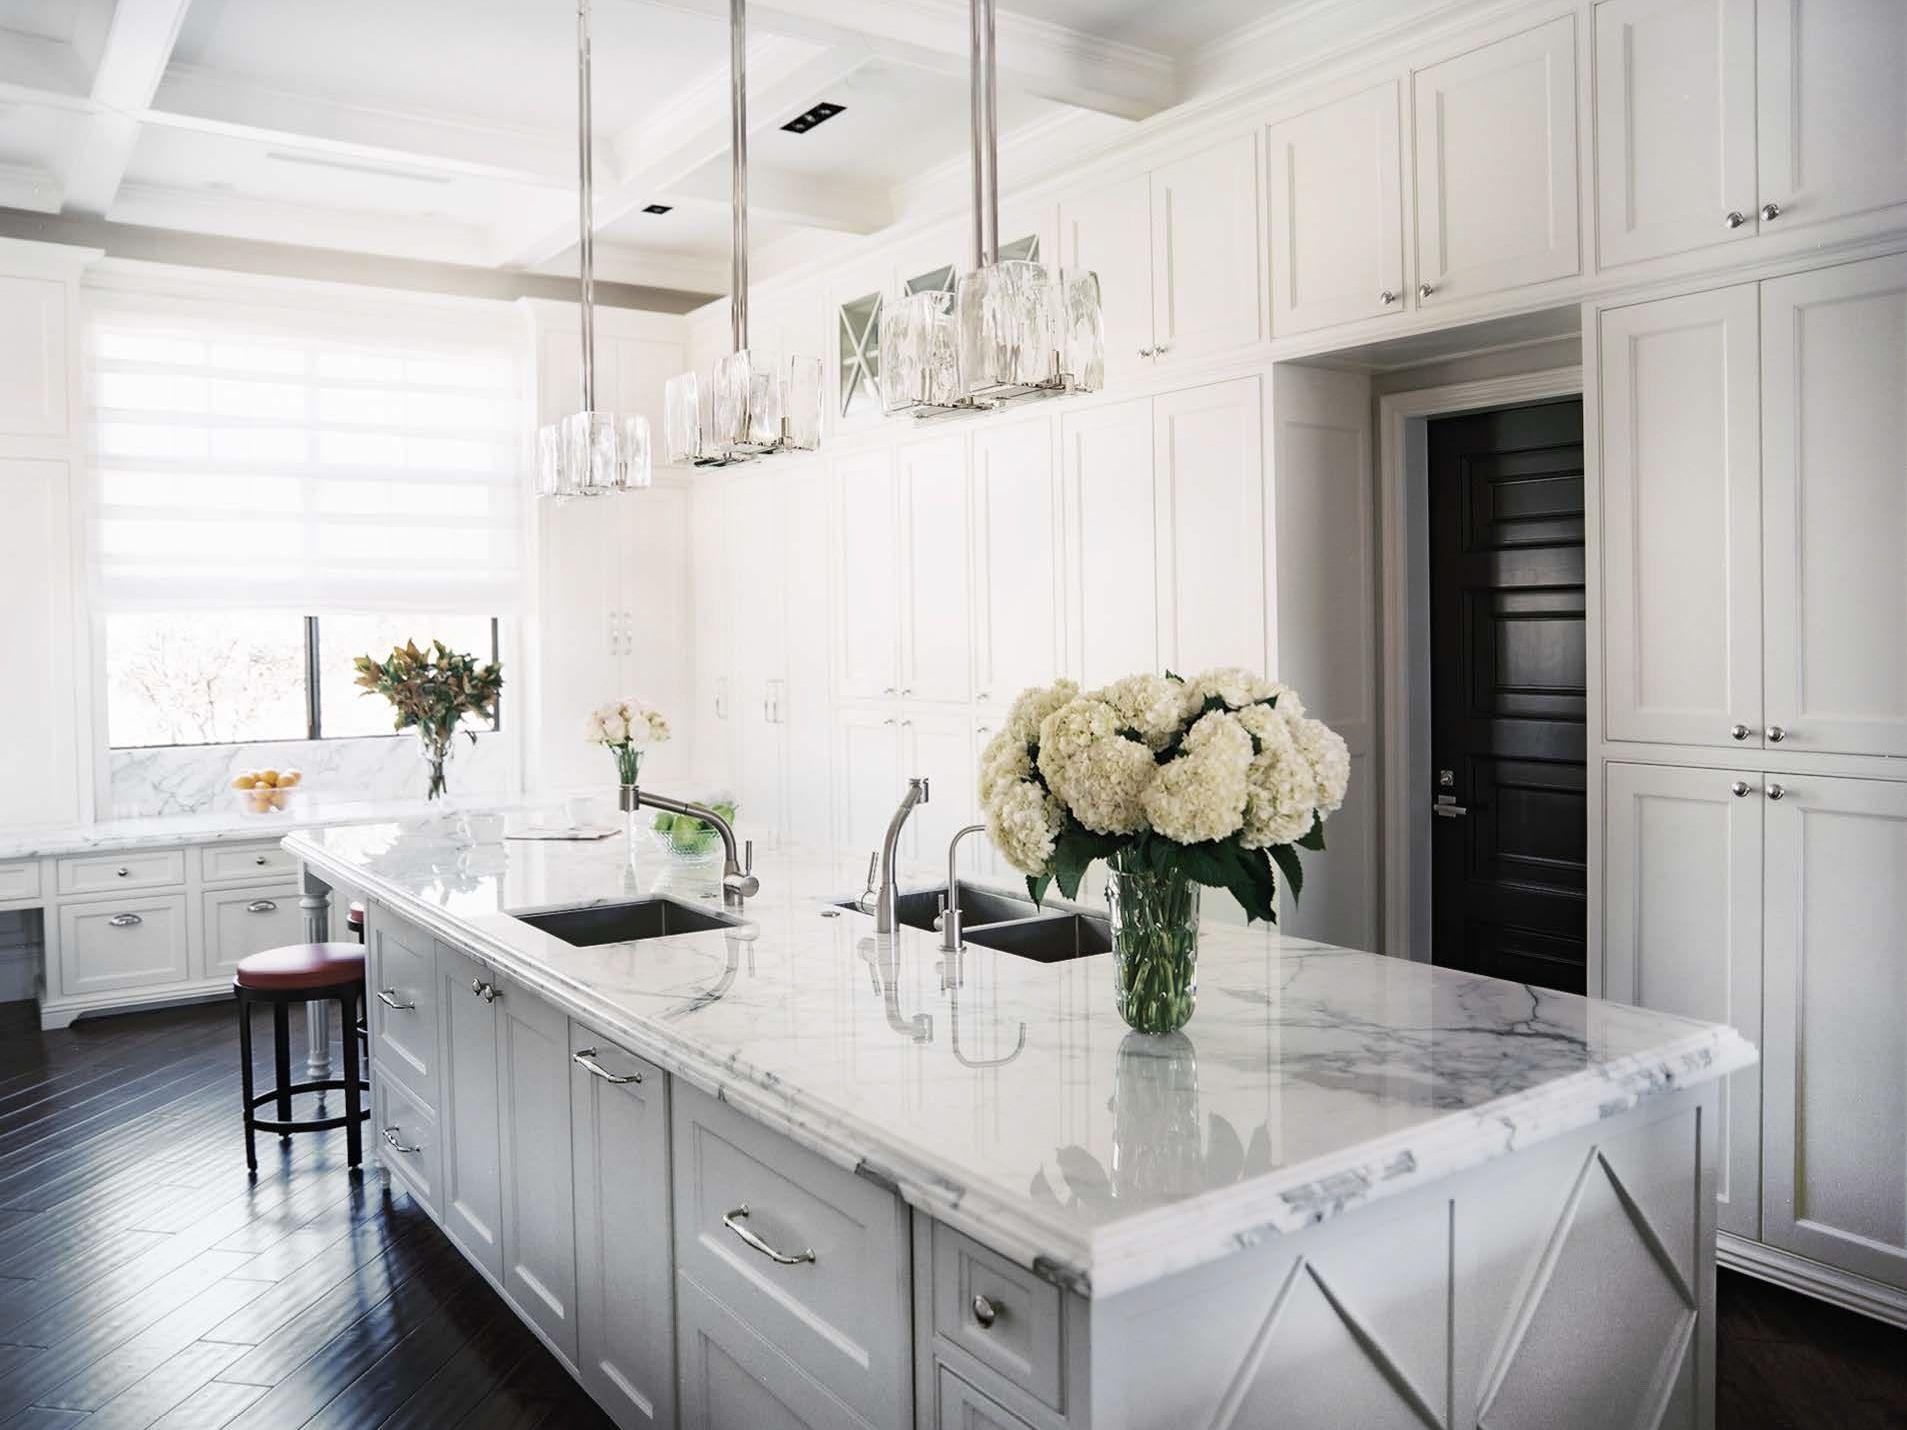 30+ Modern White Kitchen Design Ideas and Inspiration